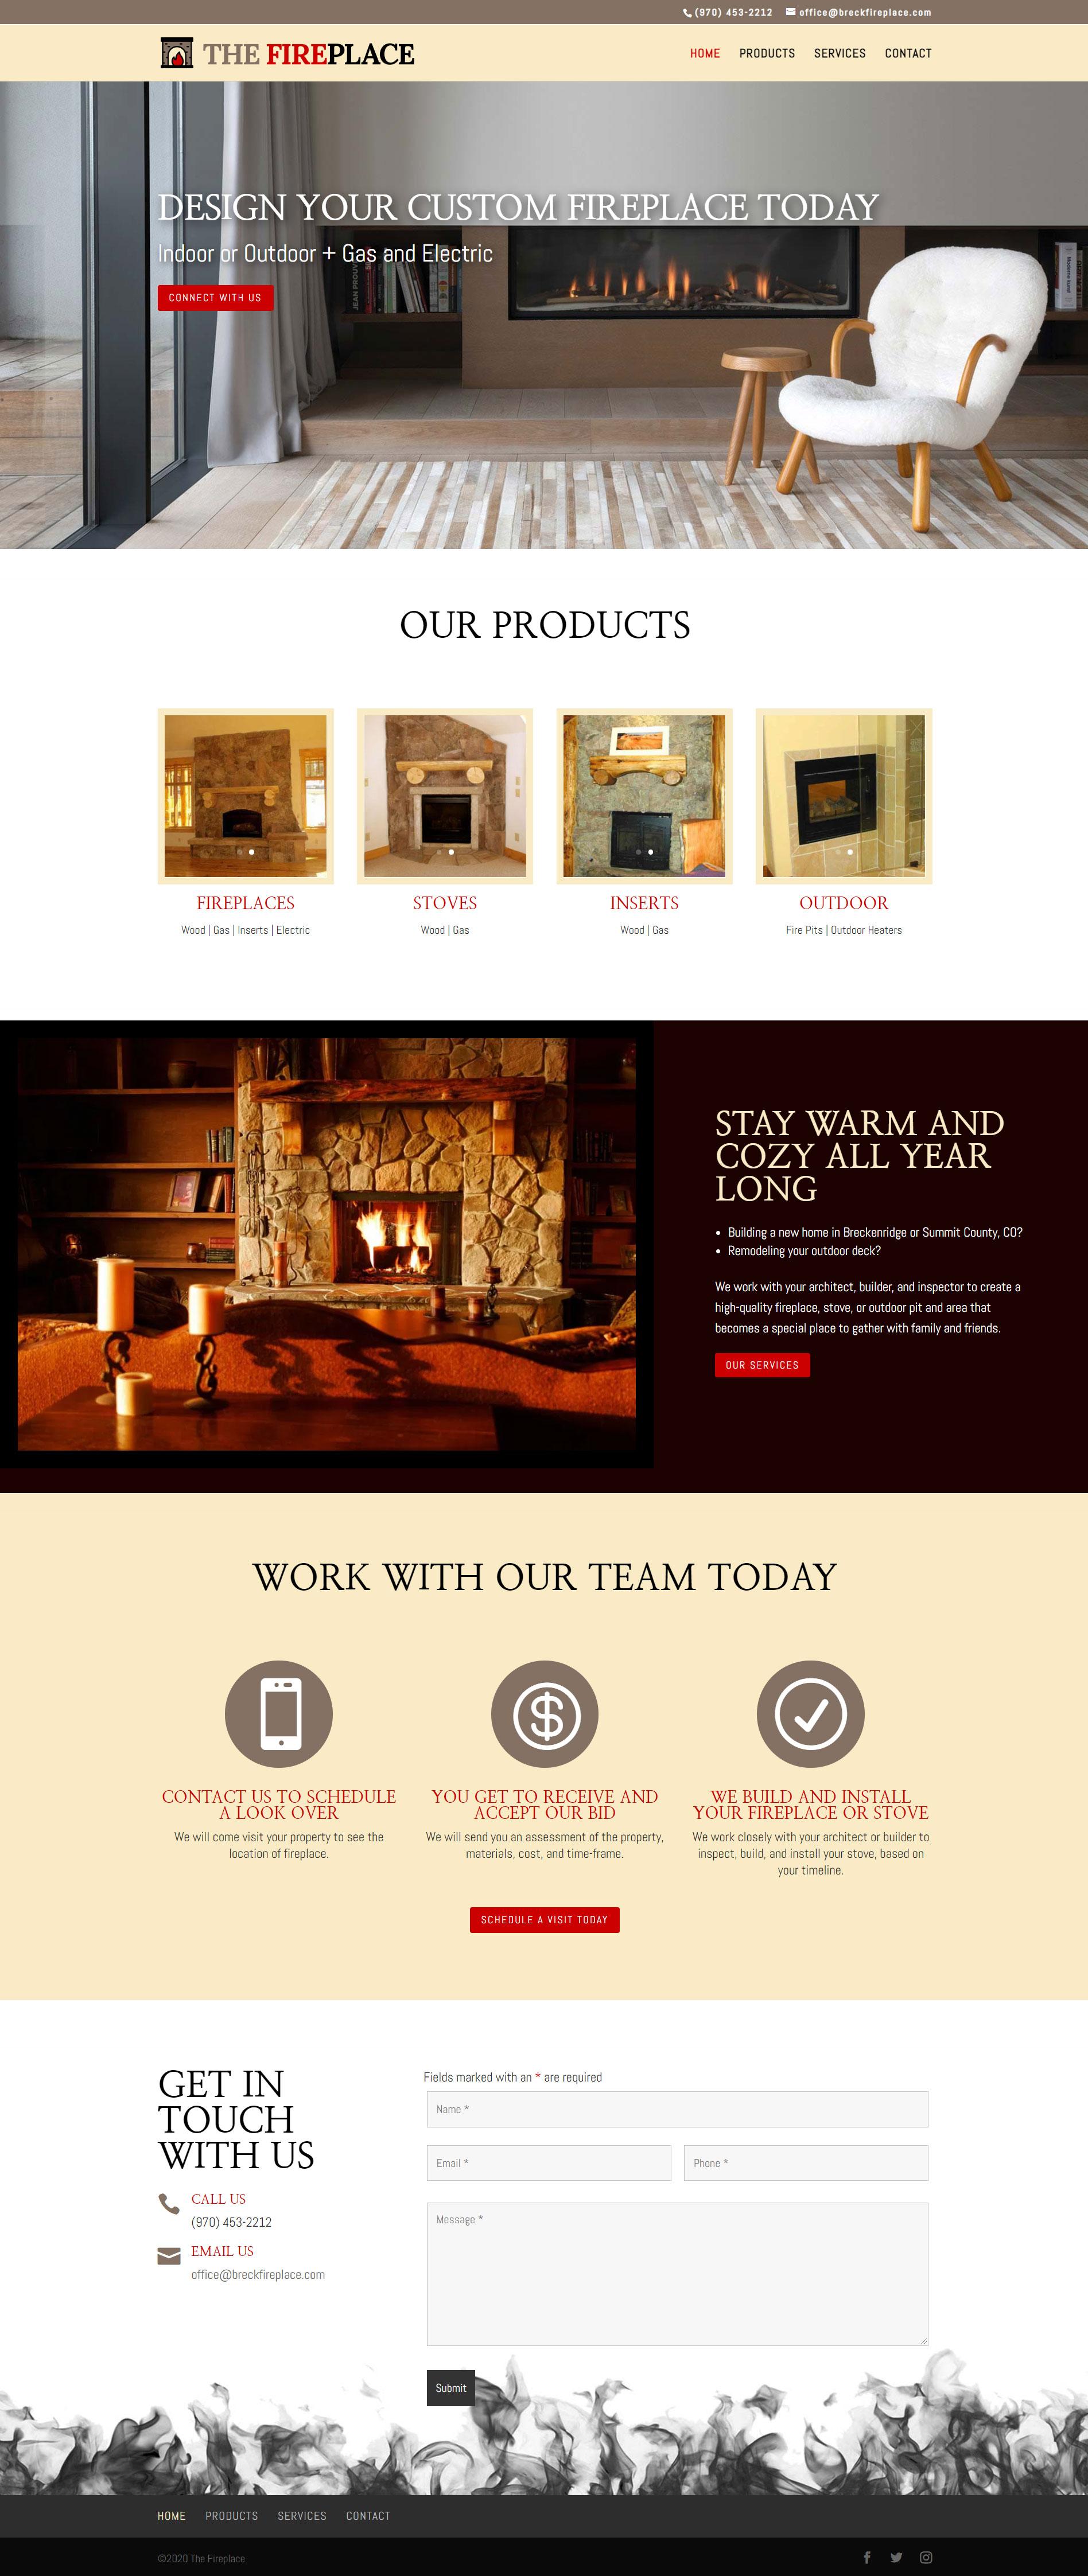 Breckenridge Custom Fireplace Builder and Installer